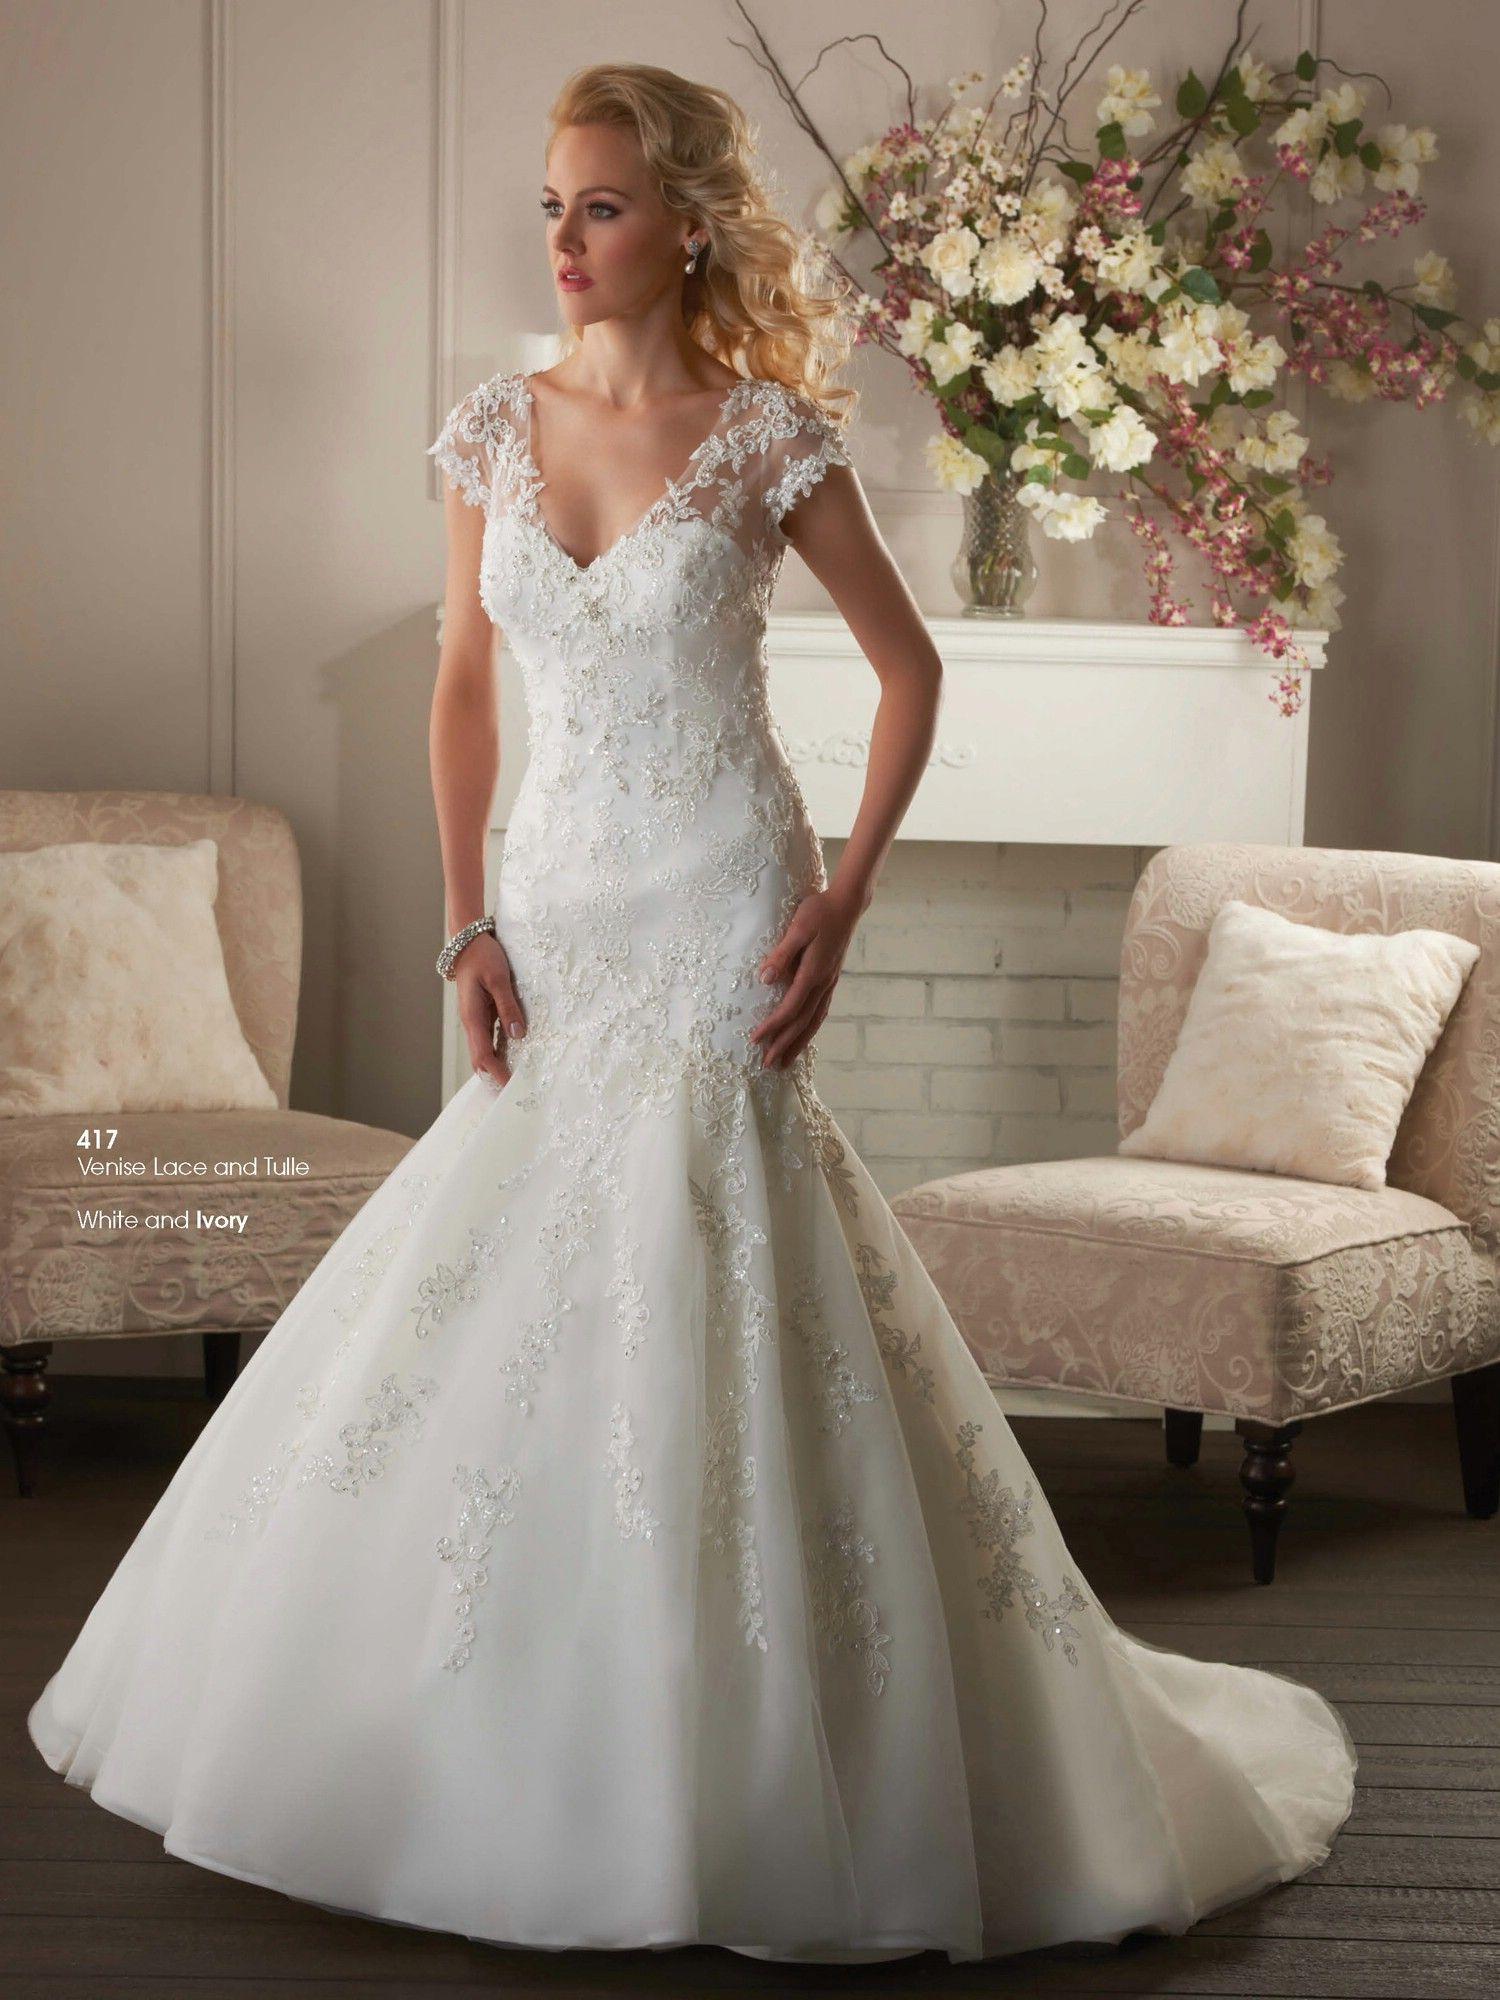 Bonny wedding dresses style 417my wedding dress